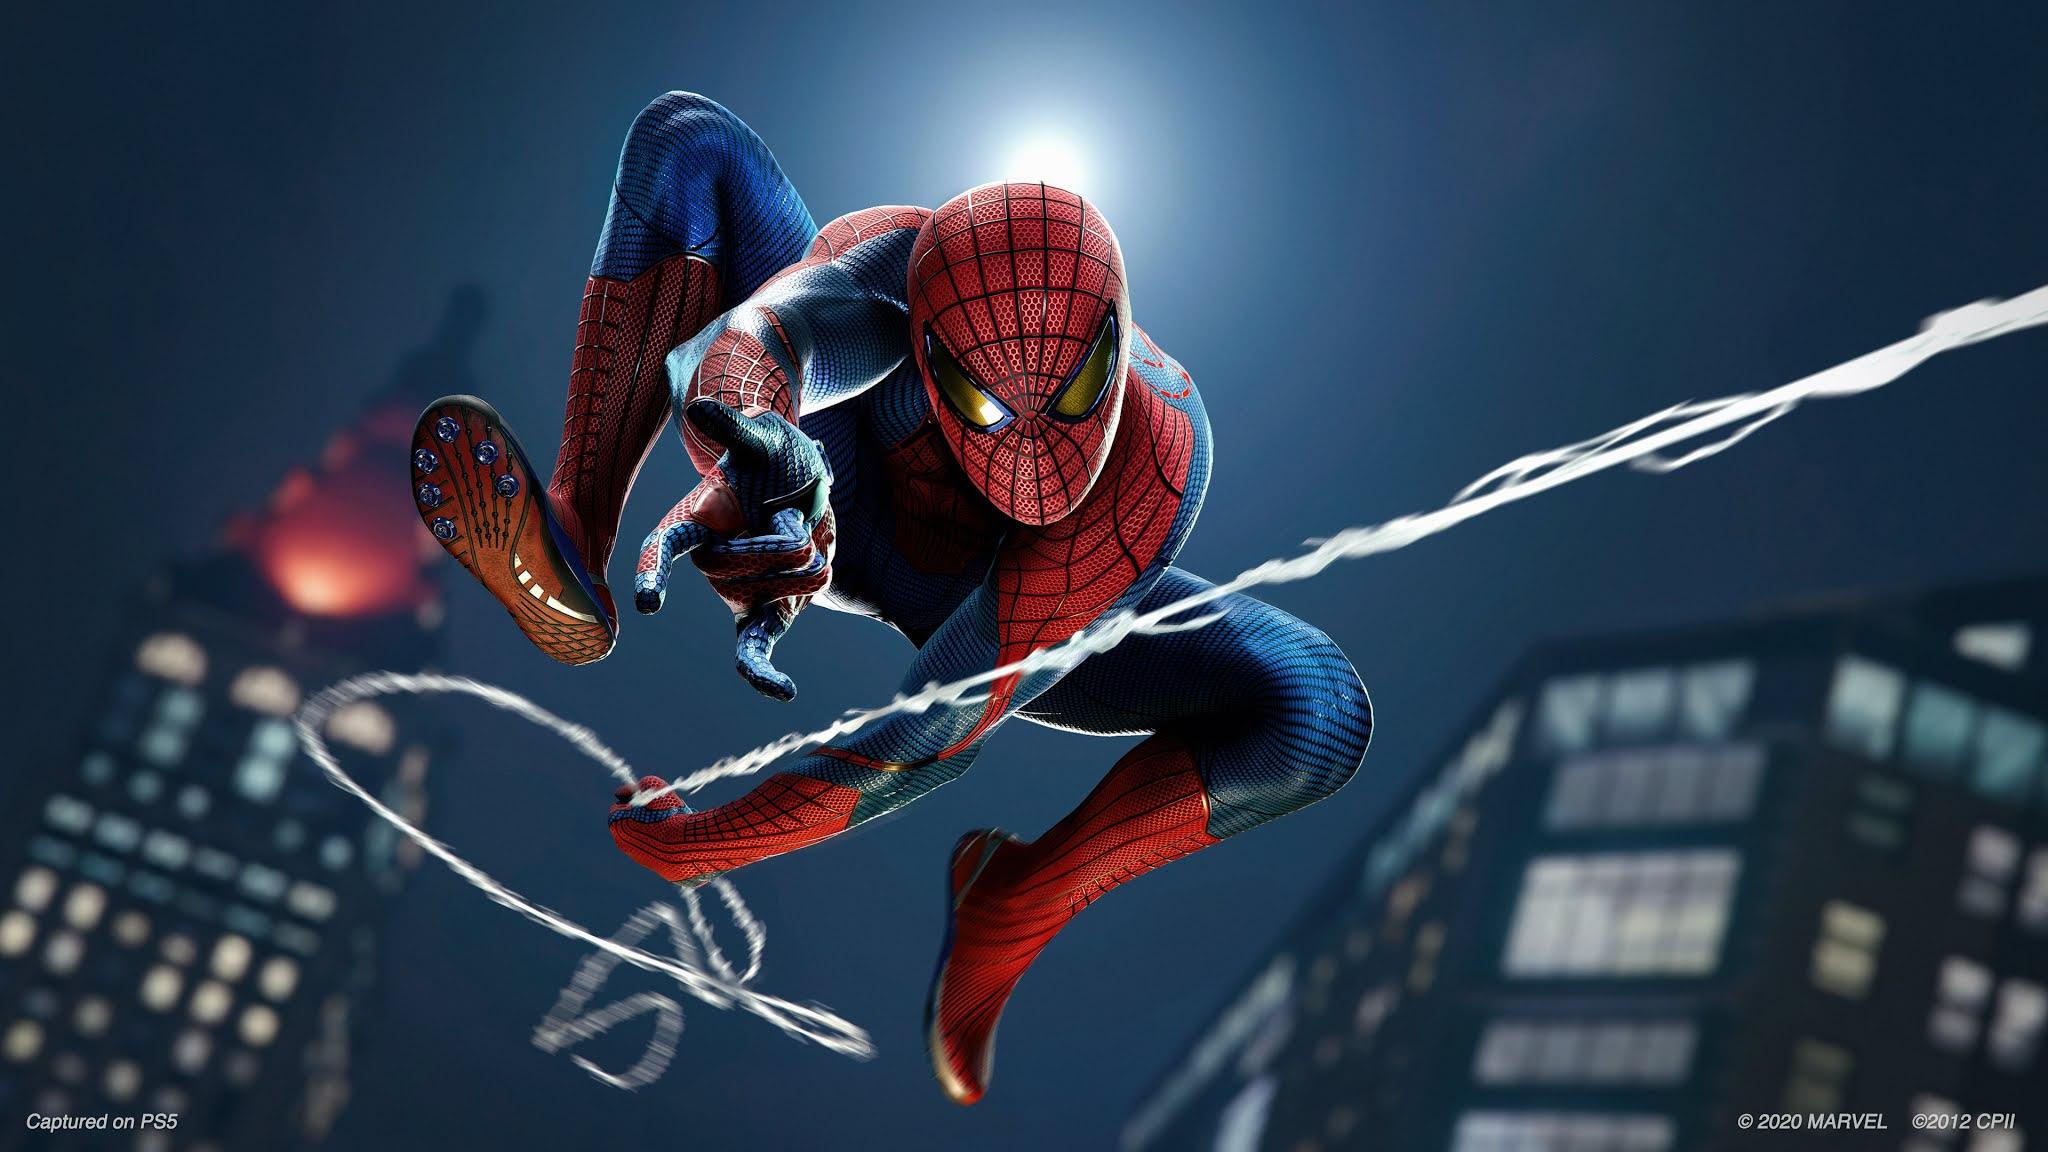 Updated Marvel's Spider-Man will still allow cross-save gene